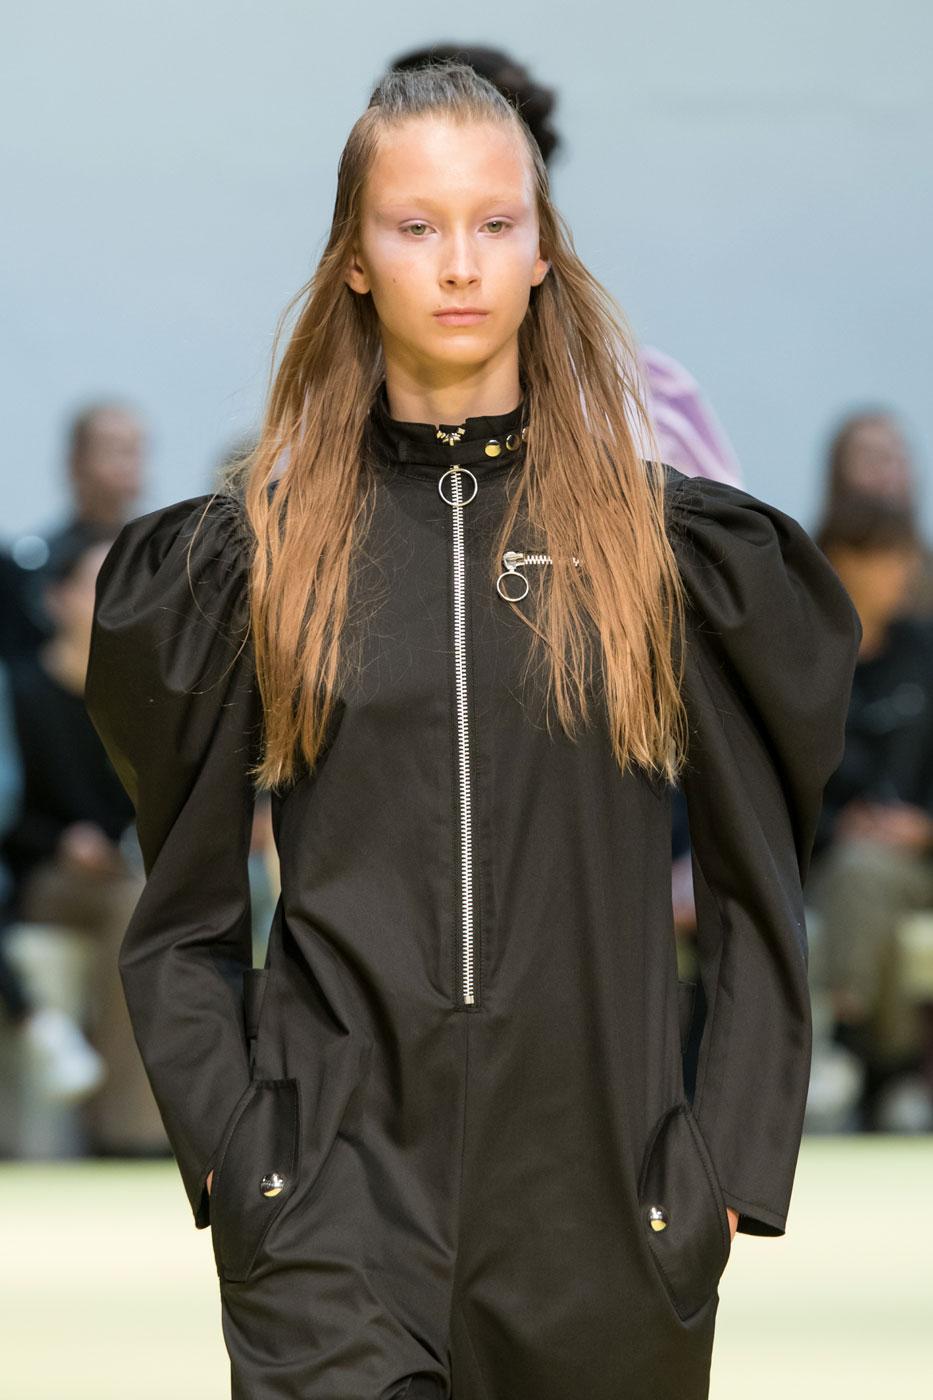 London Fashion Week: cele mai noi tendinte de frumusete